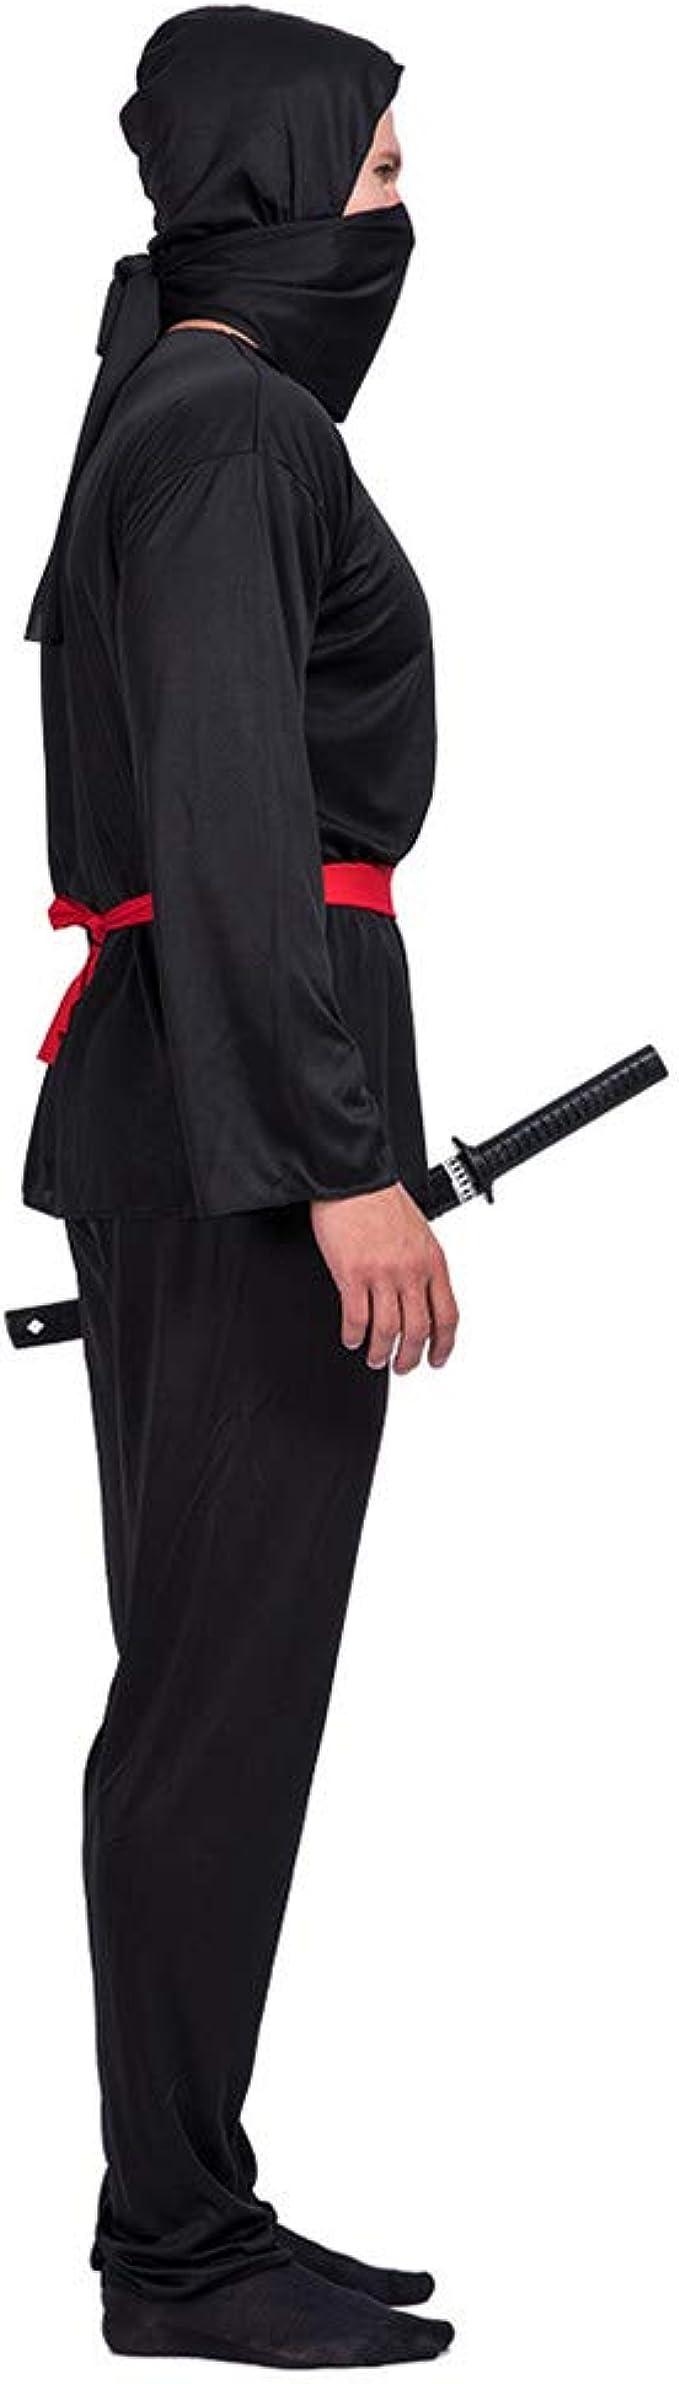 Amazon.com: Ninja Disfraz de adulto japonés Samurai Assassin ...